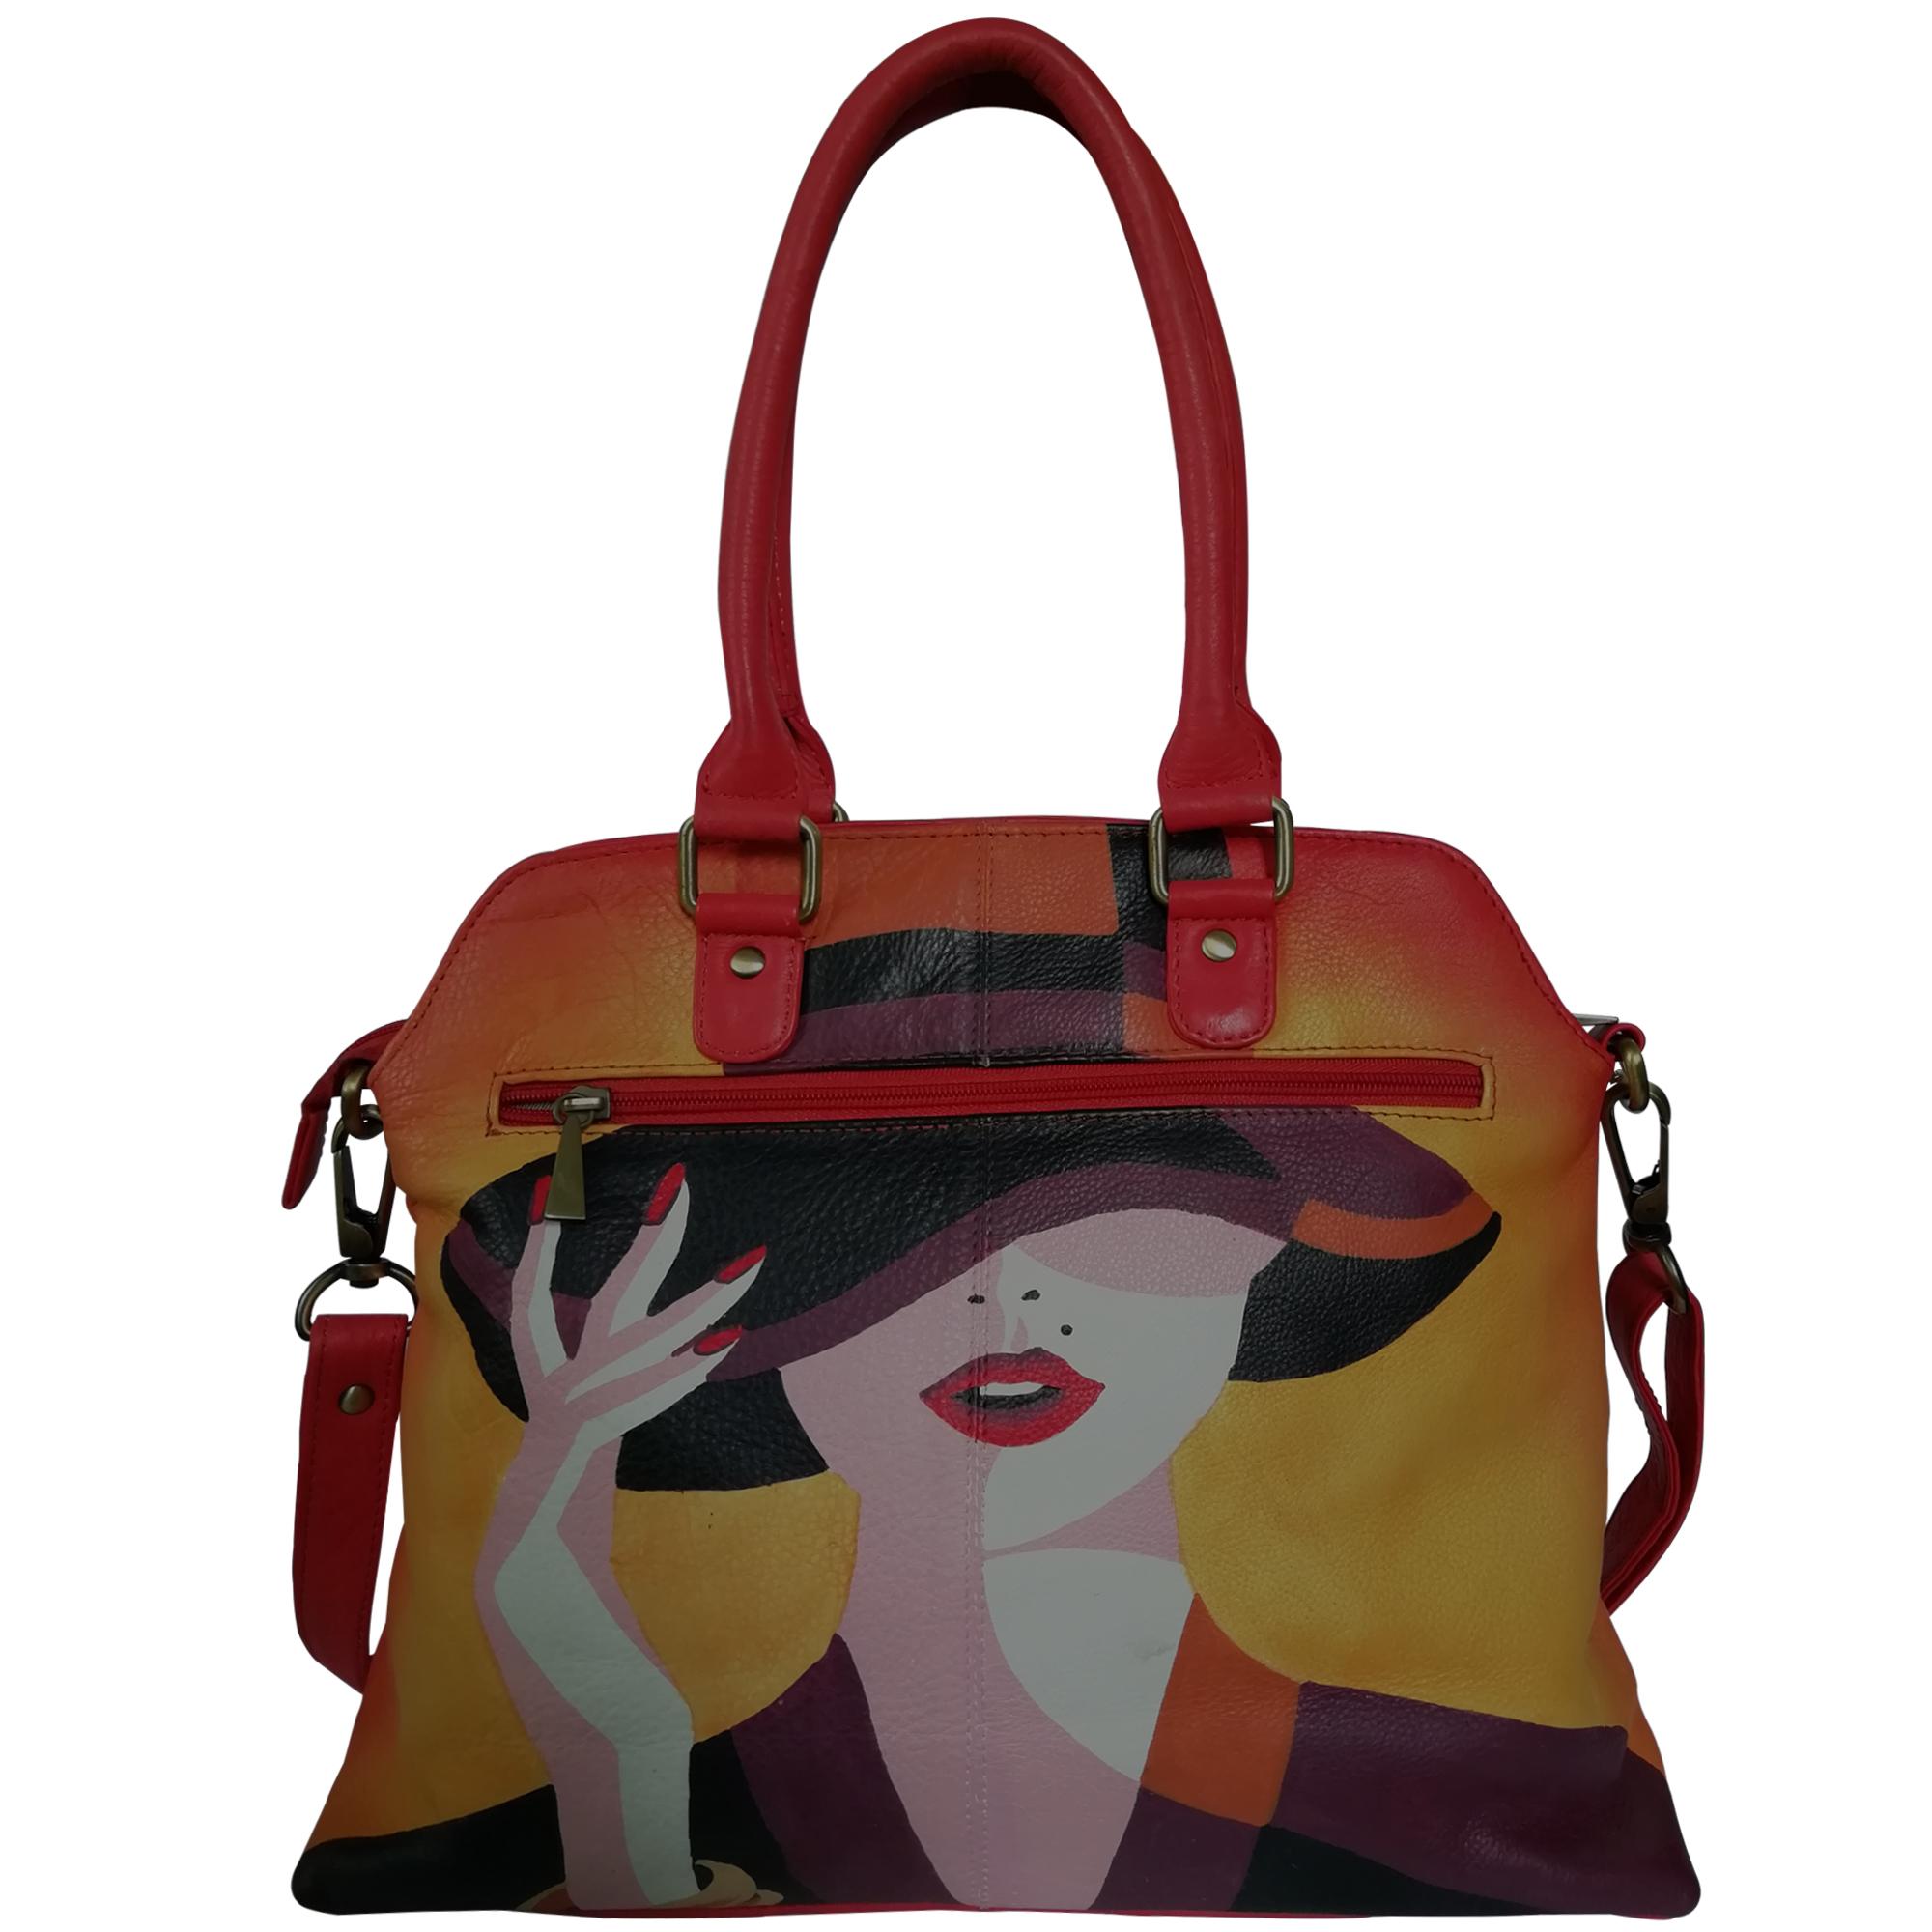 New Hand Painted Leather Shoulder Handbag Design Lady In Hat